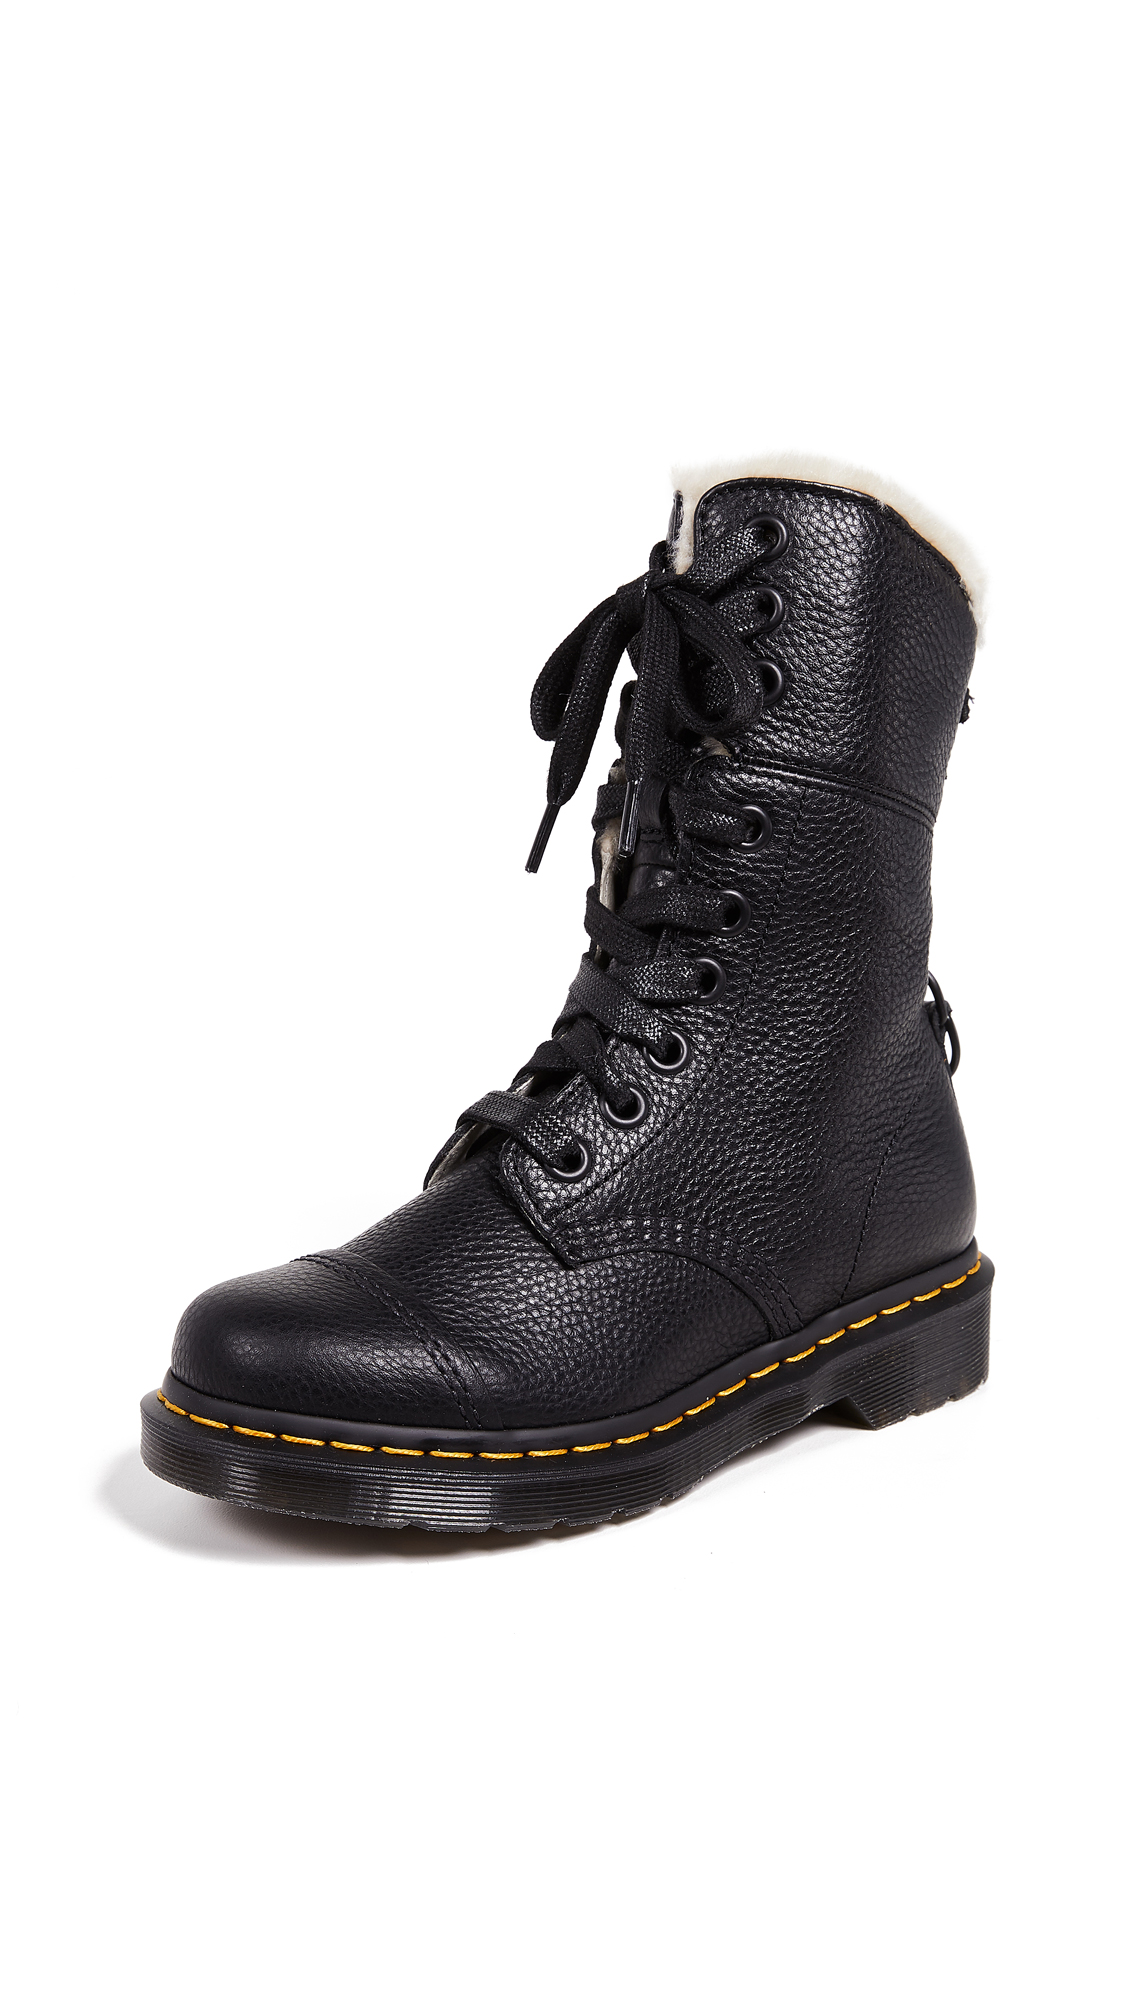 Buy Dr. Martens Aimilita FL 9 Eye Boots online, shop Dr. Martens